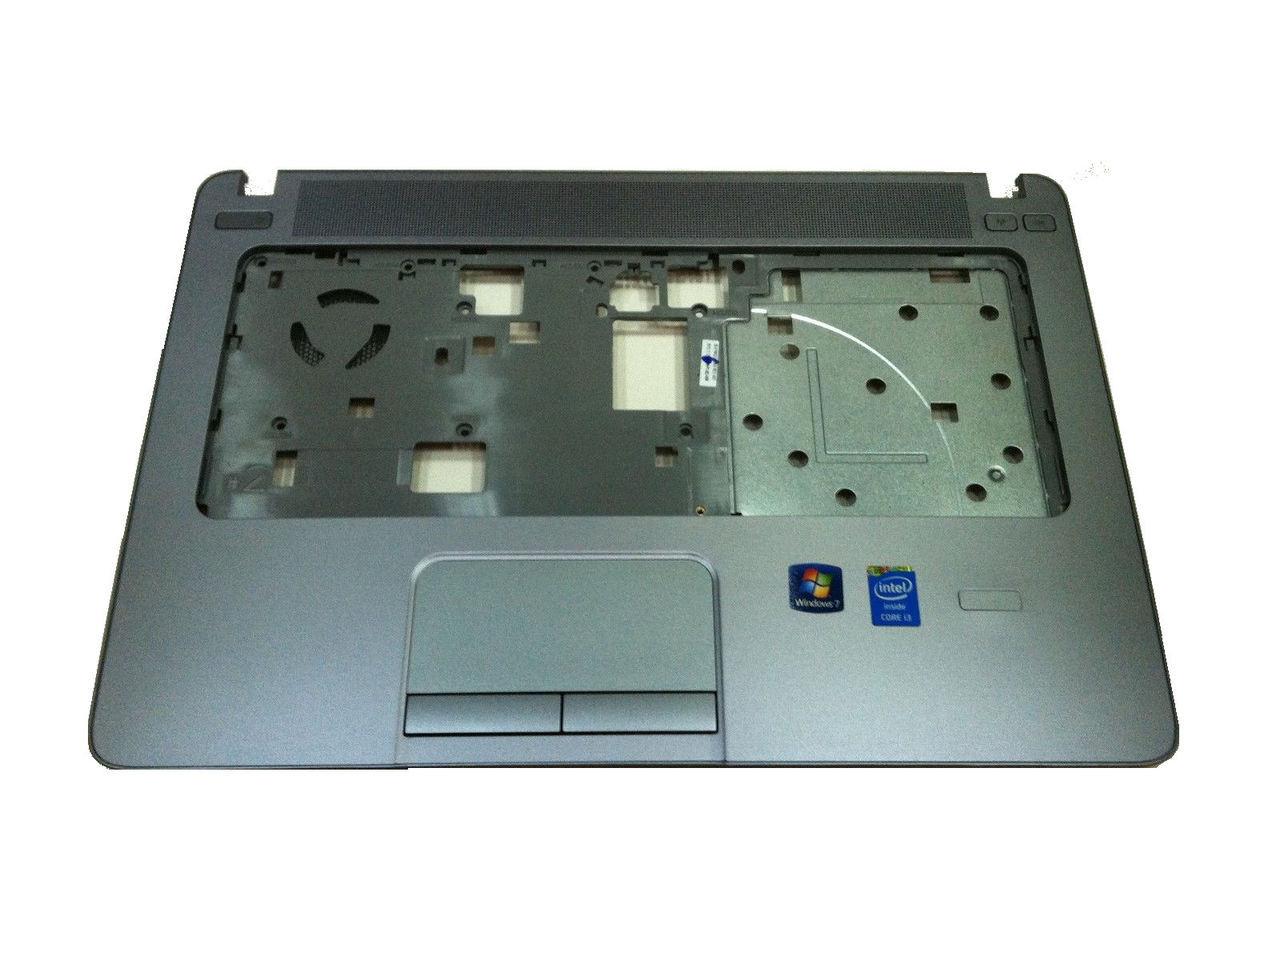 HP ProBook 445 G2 Wireless Button Windows Vista 32-BIT